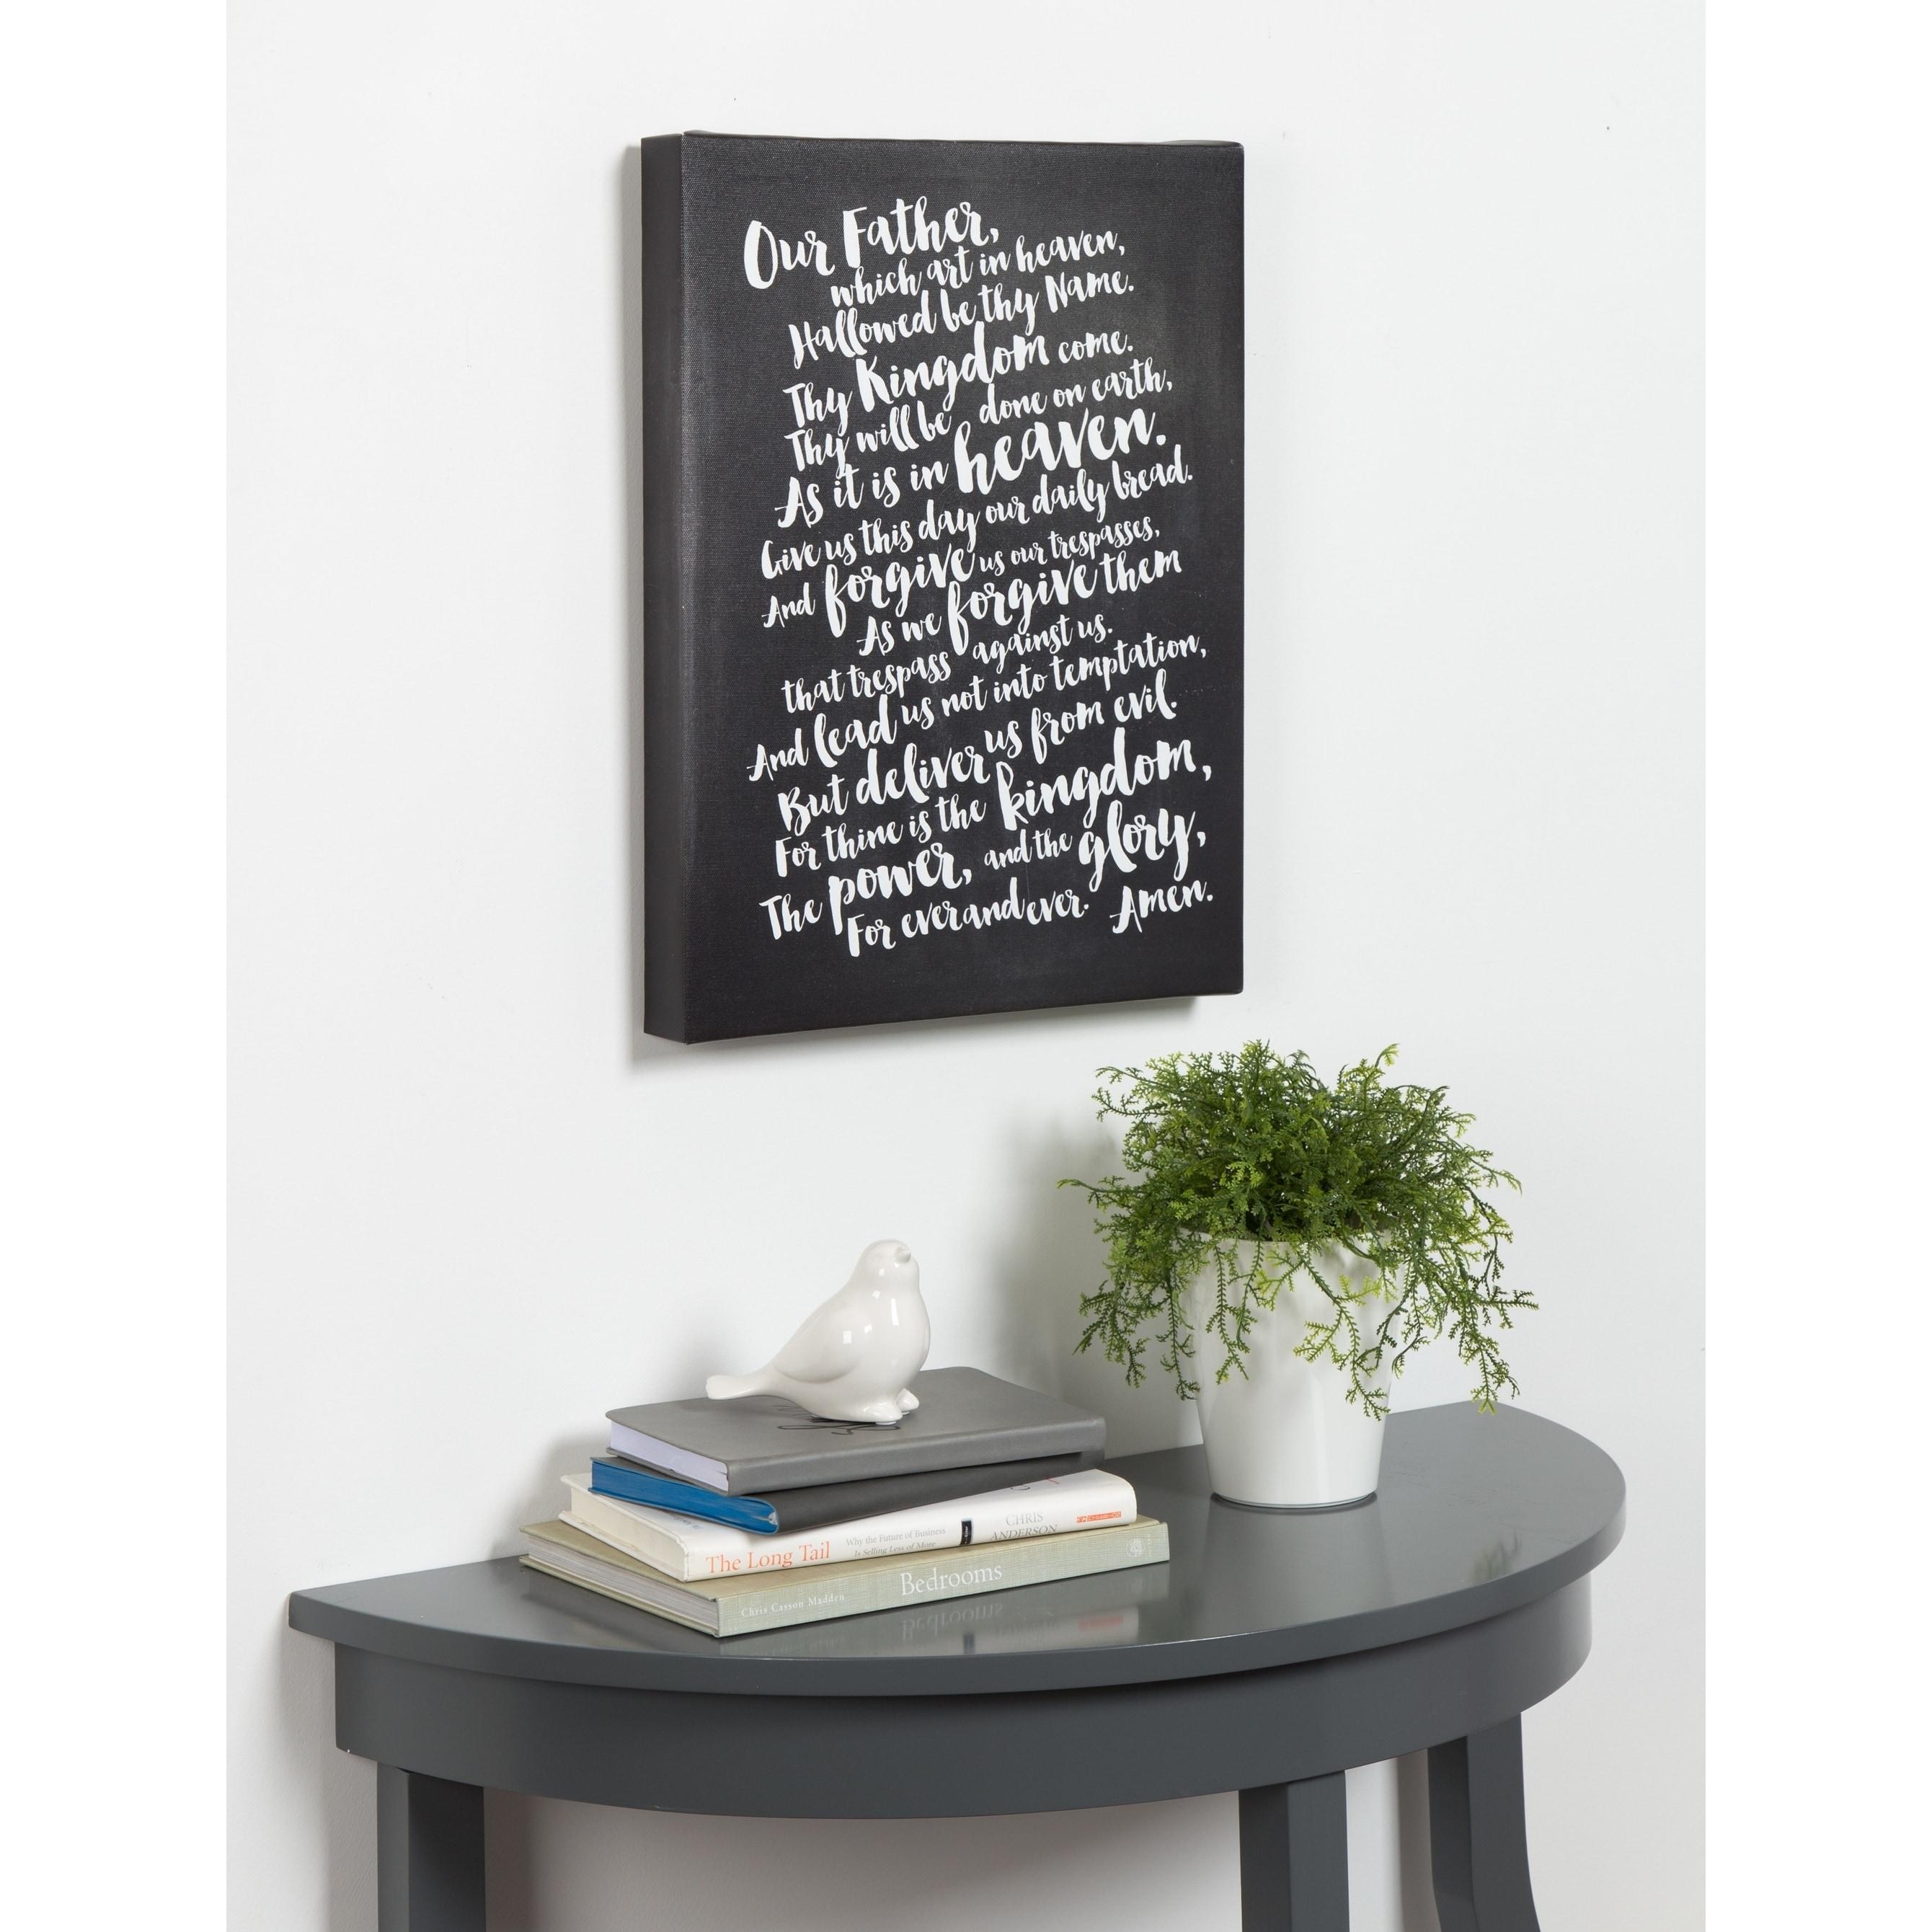 Unique Prayer Room Live Image Collection - Living Room Design Ideas ...